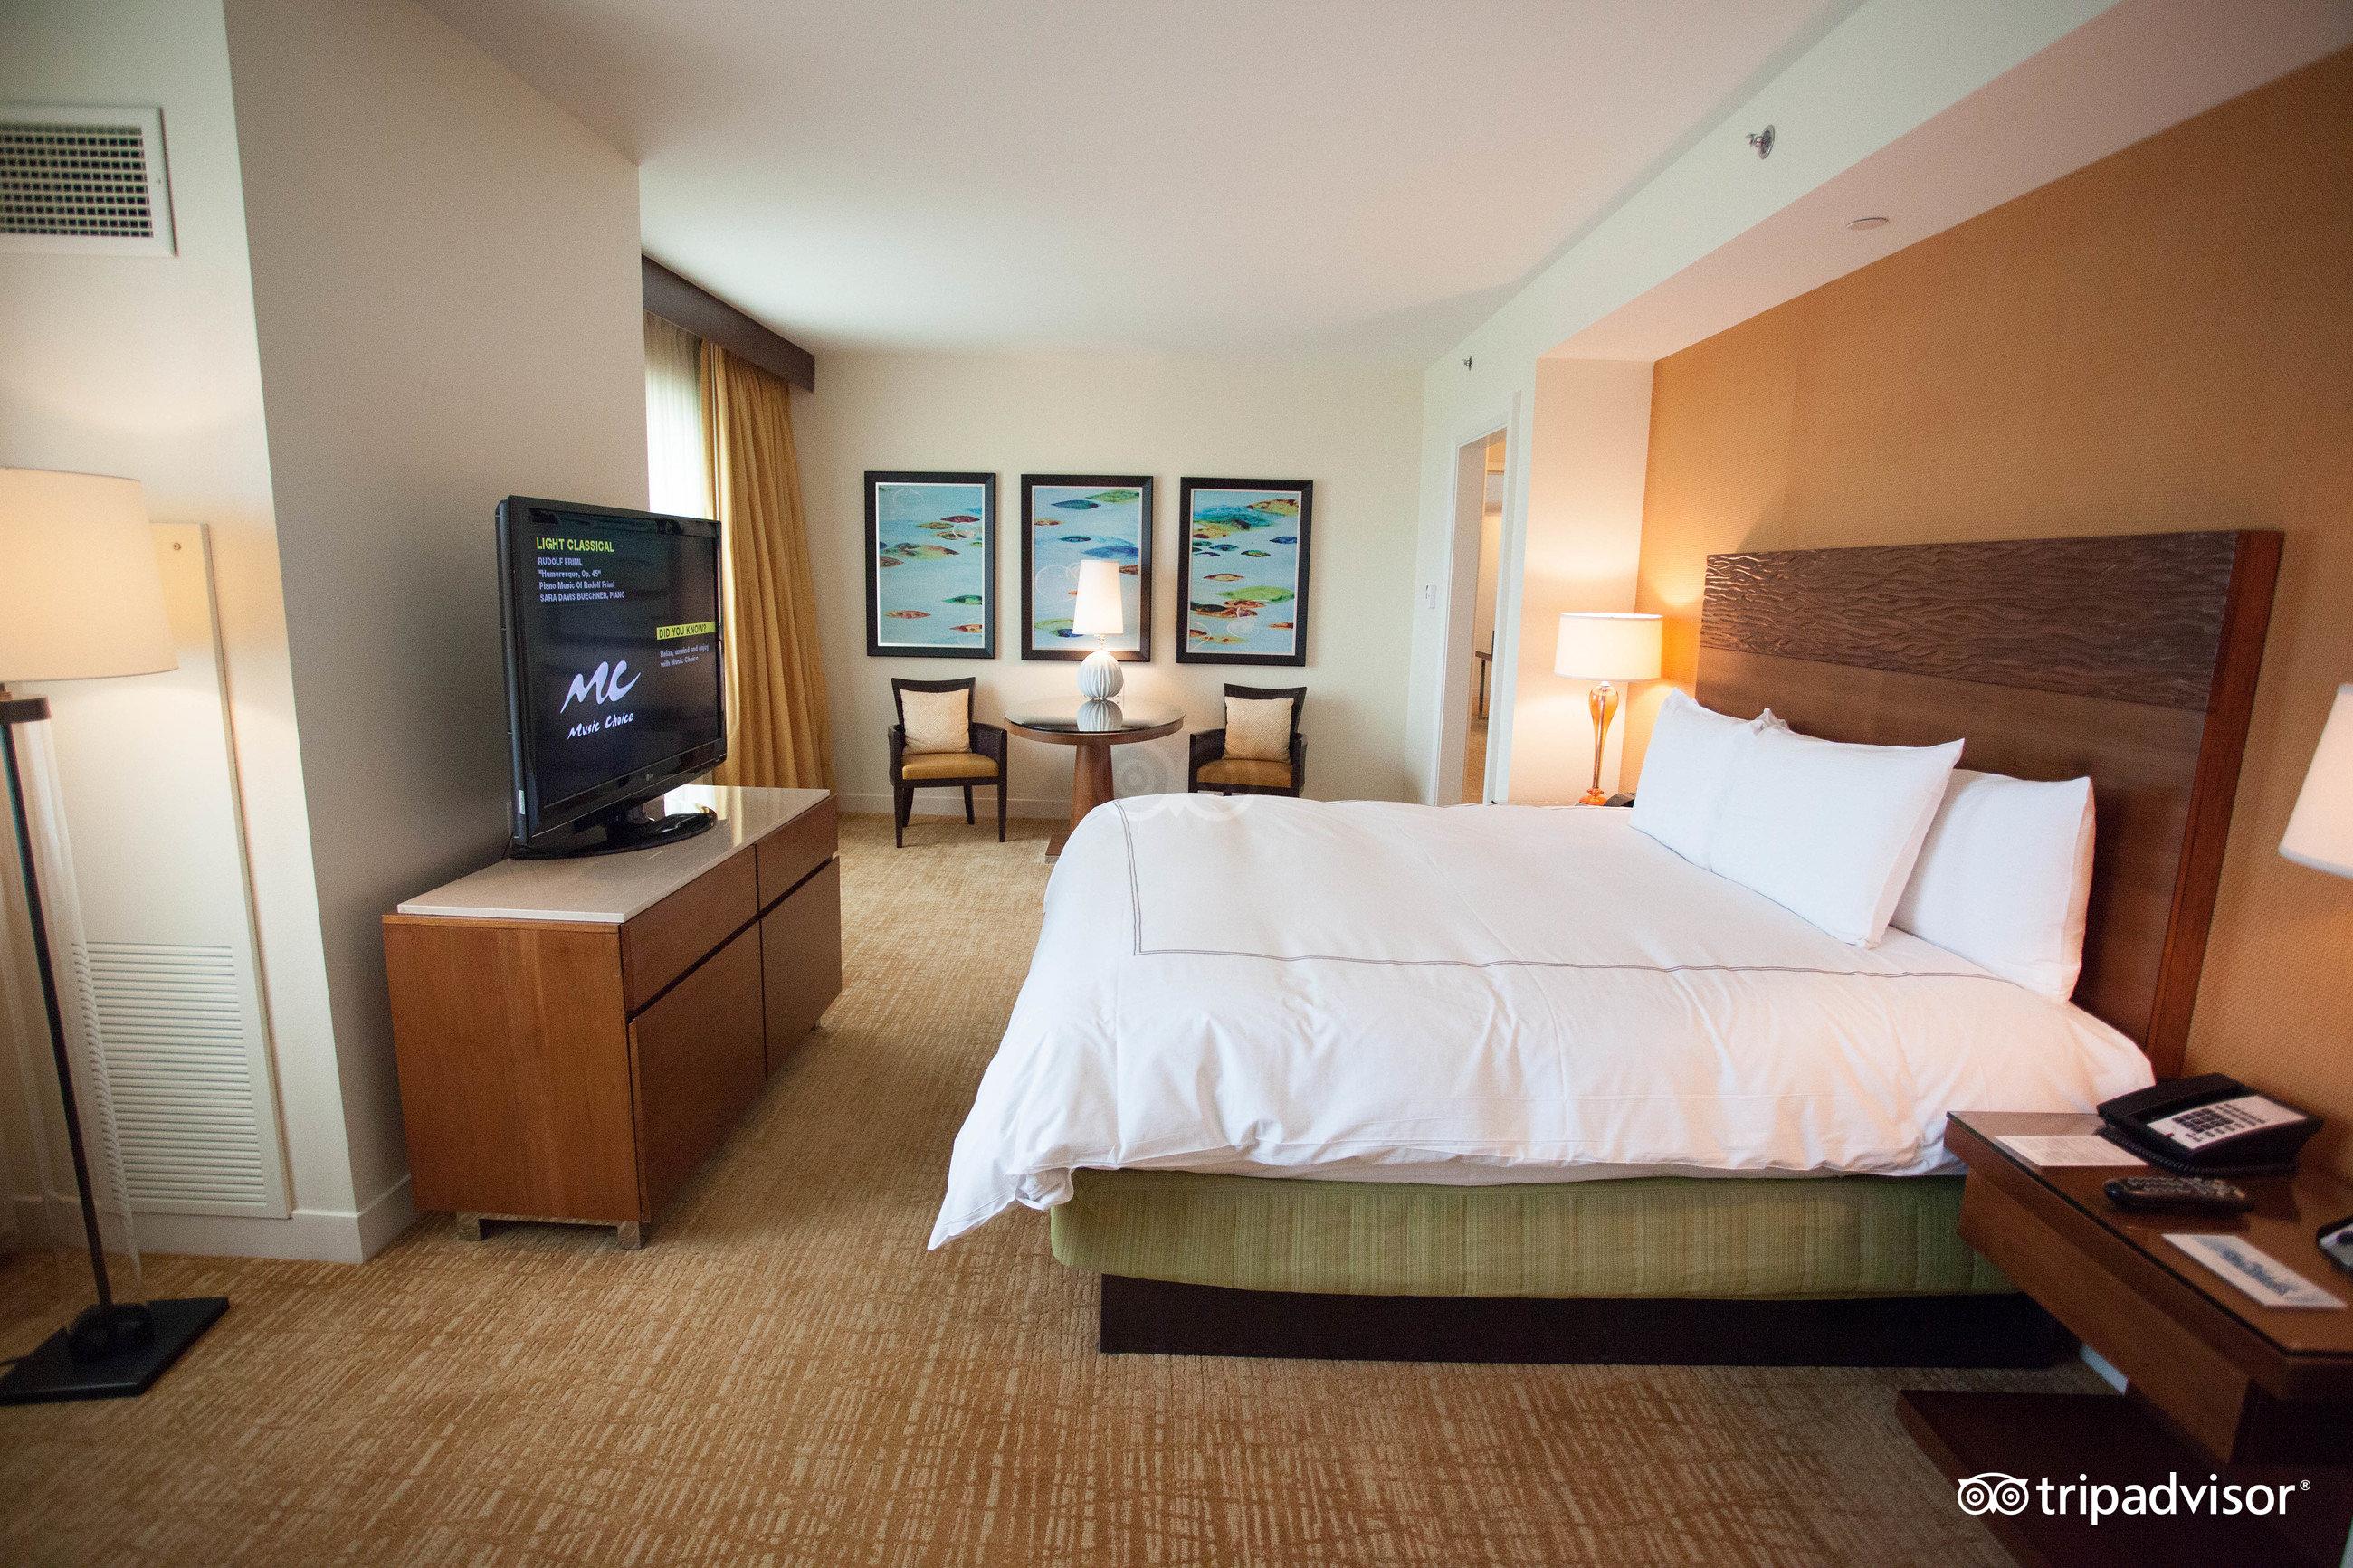 2 bedroom suites in florida%0A how to diy wedding invitations